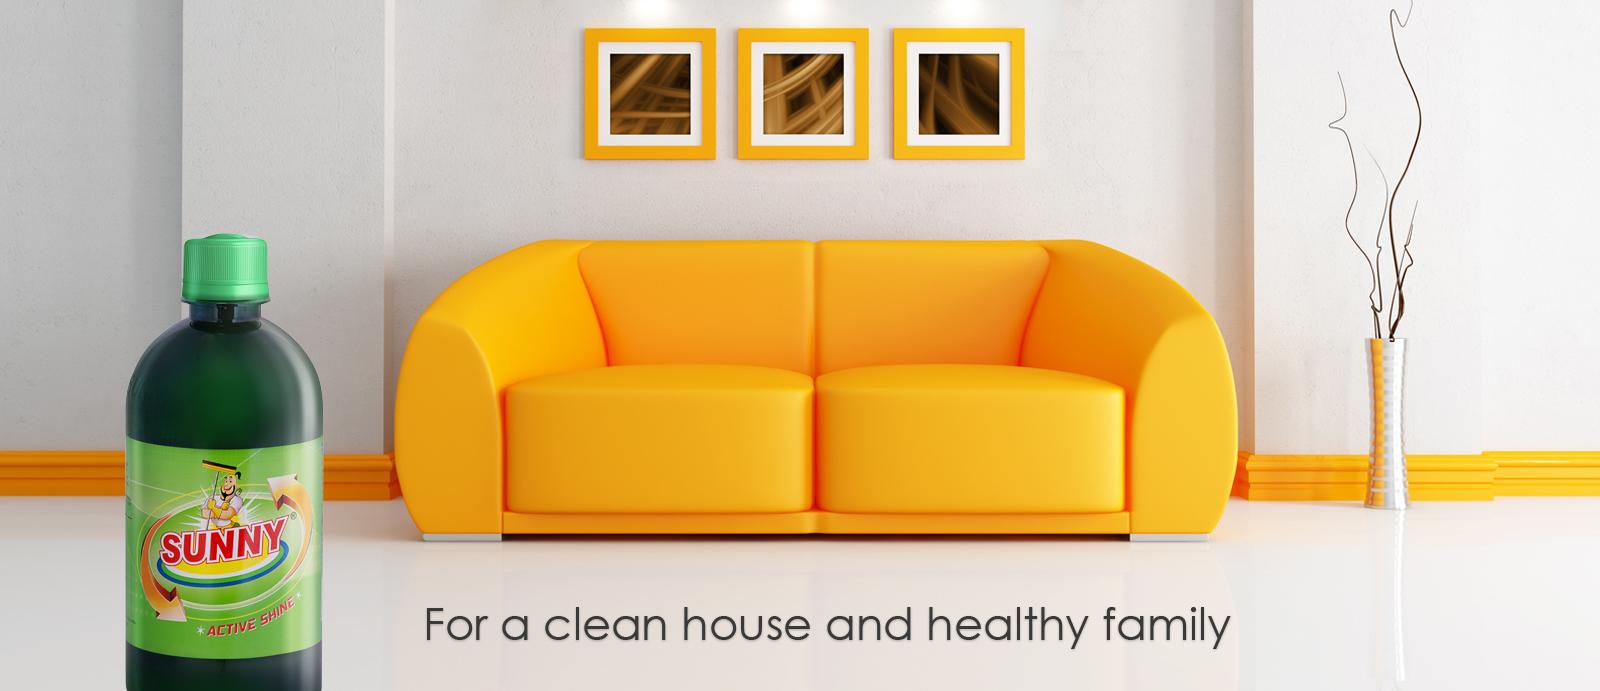 Sunny Home Care